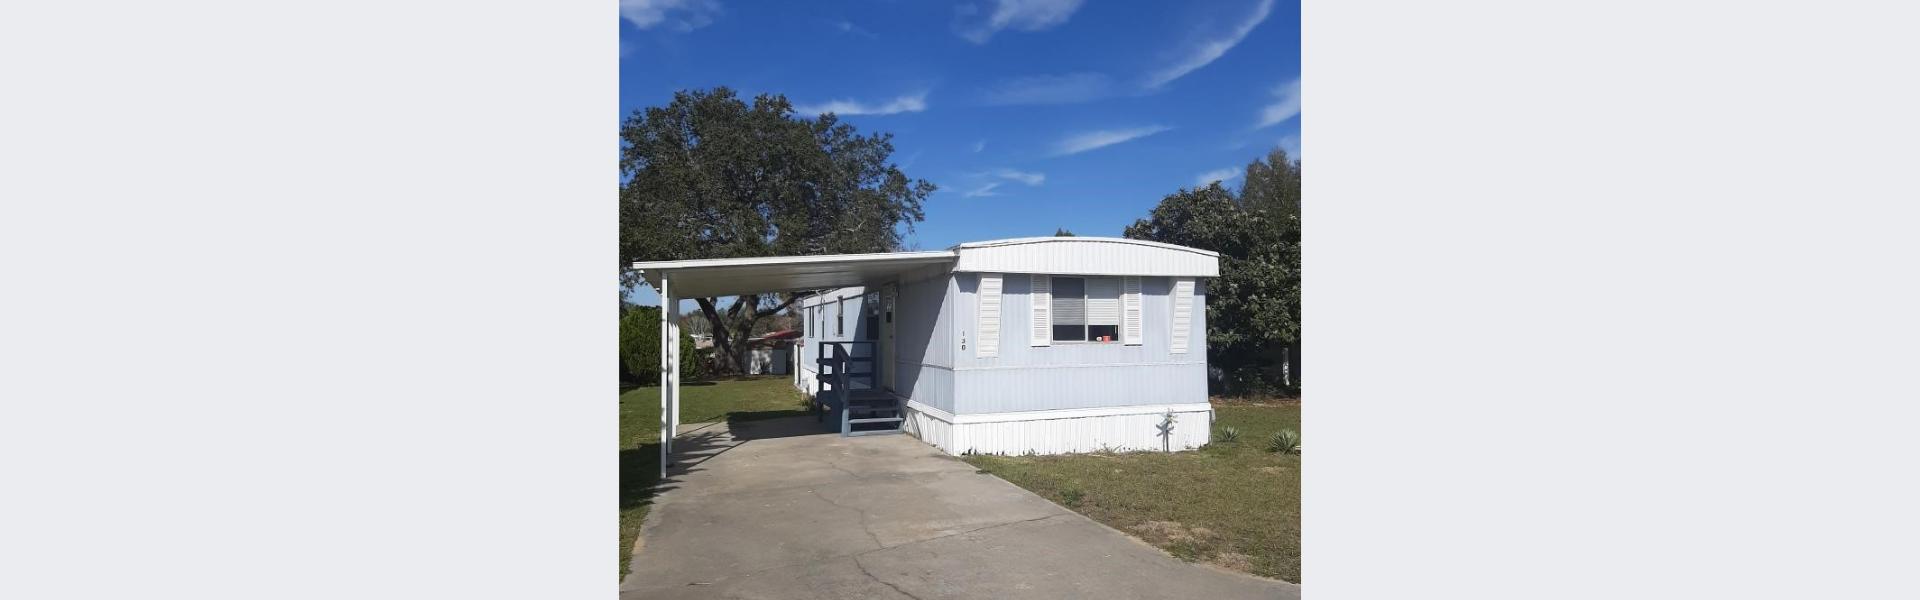 130 Kelly Court Davenport, FL